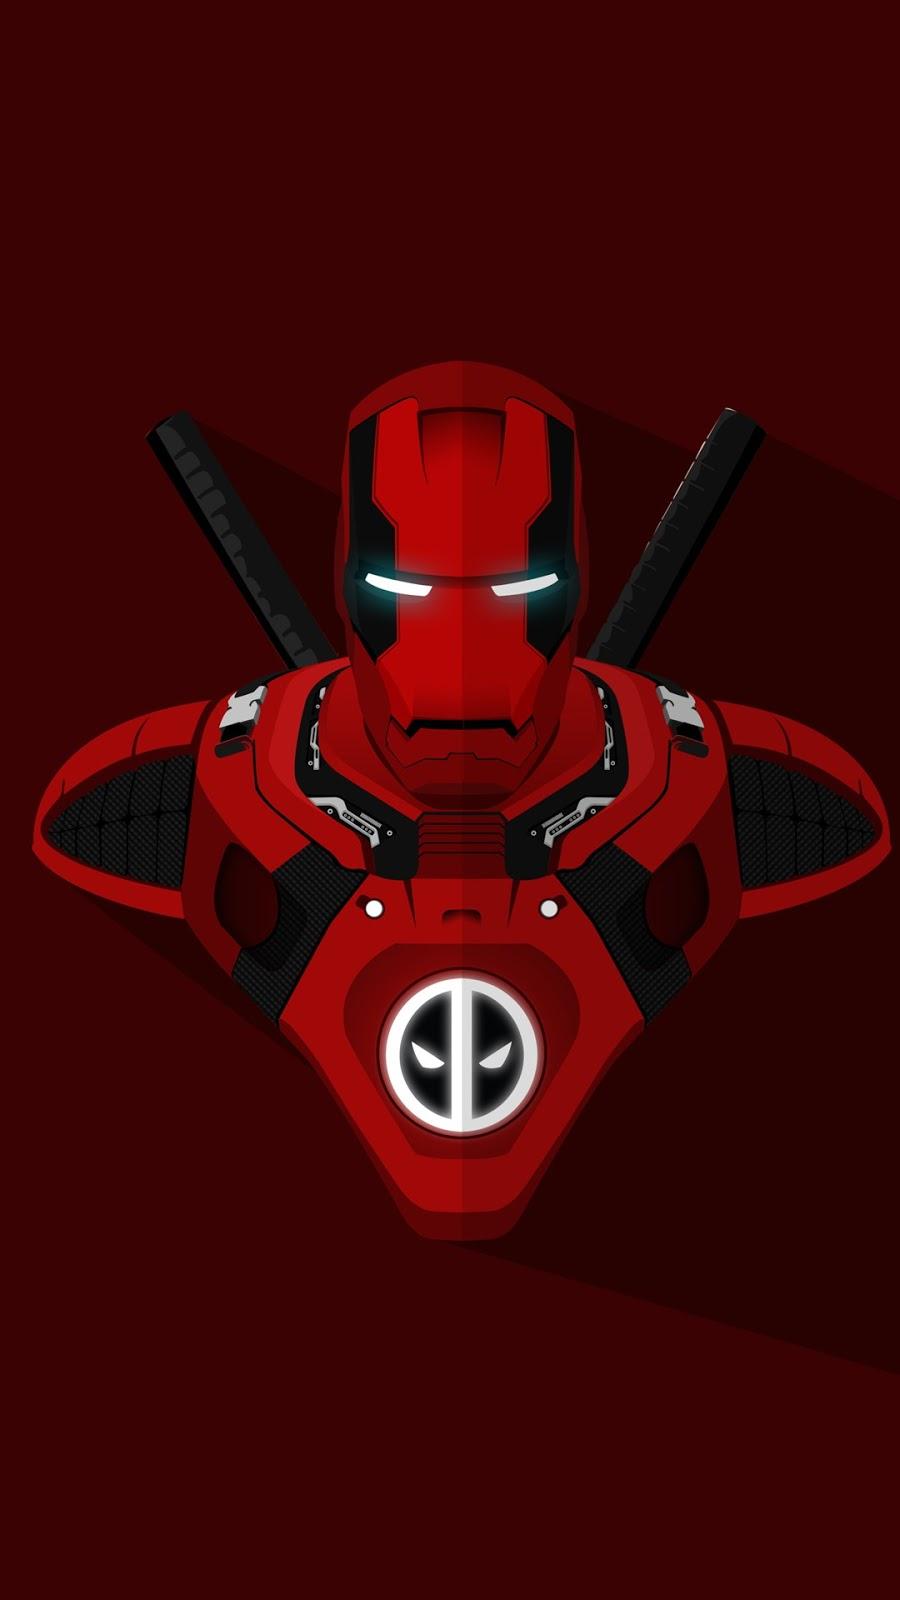 Papel de parede Homem de Ferro Deadpool para PC, Notebook, iPhone, Android e Tablet.